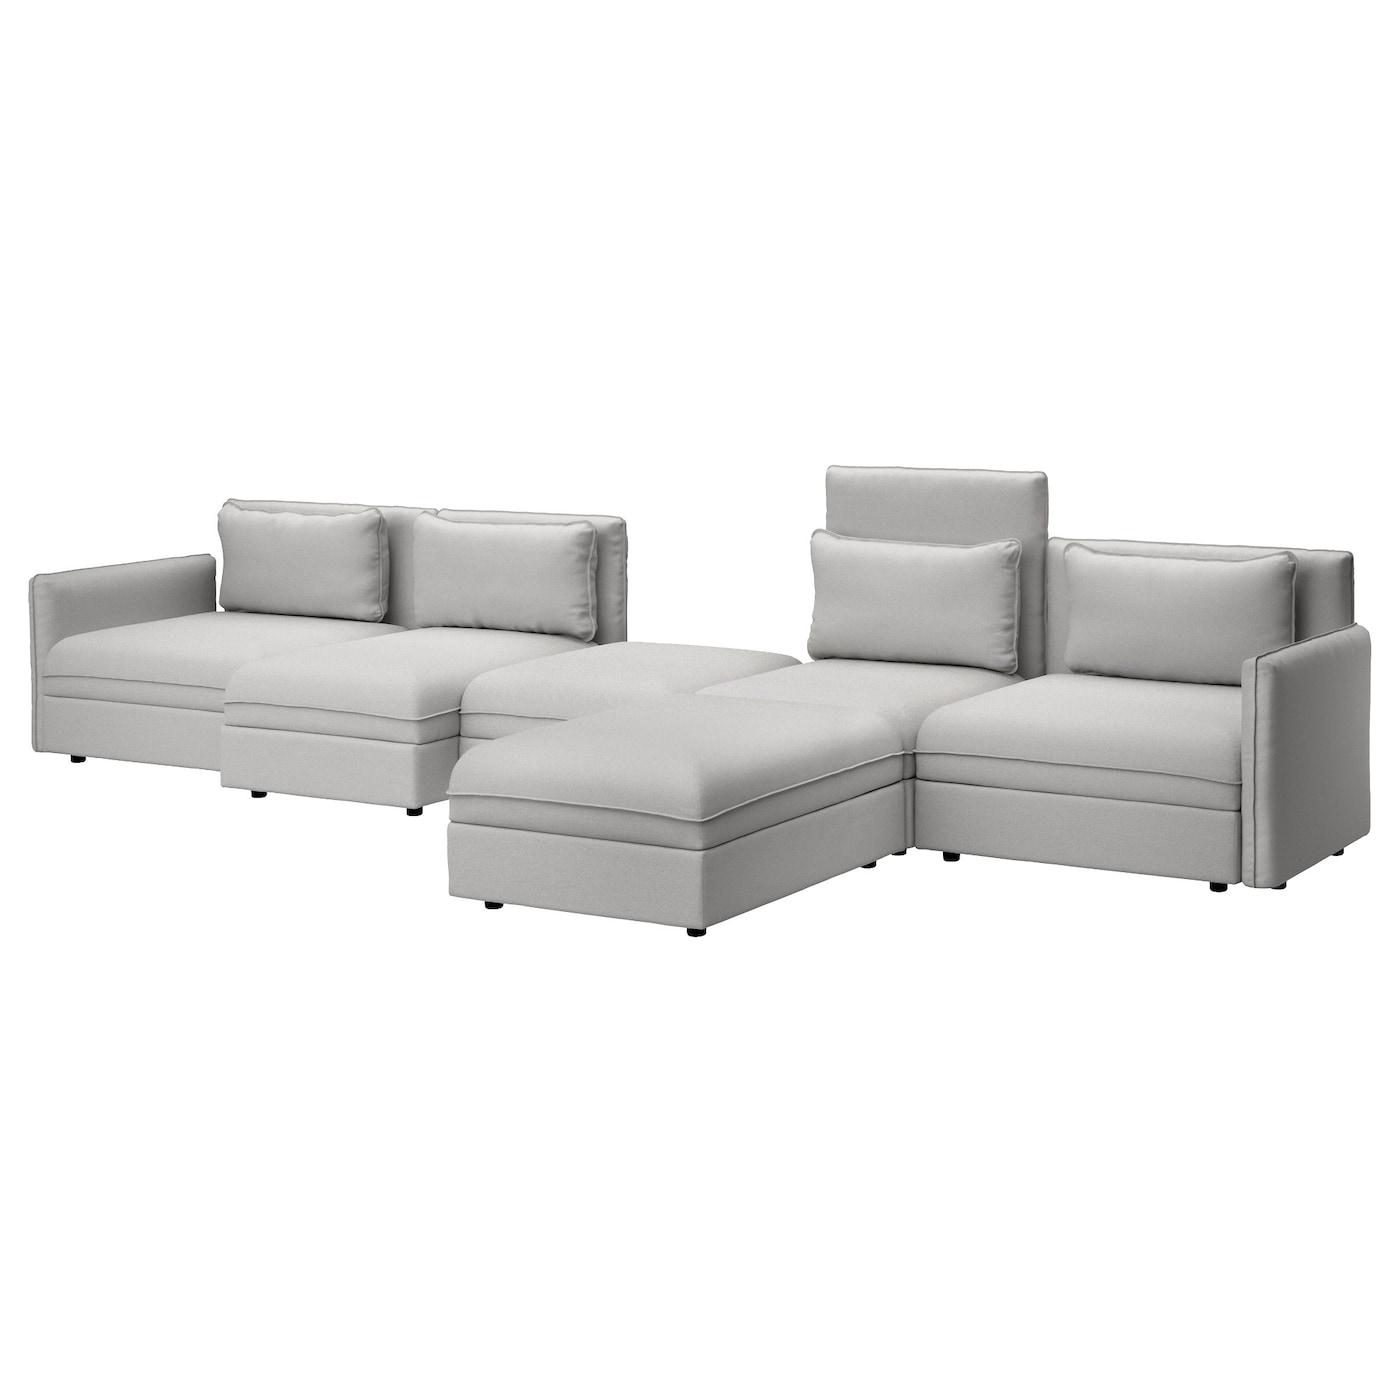 Sofás Modulares | Compra Online IKEA - photo#39